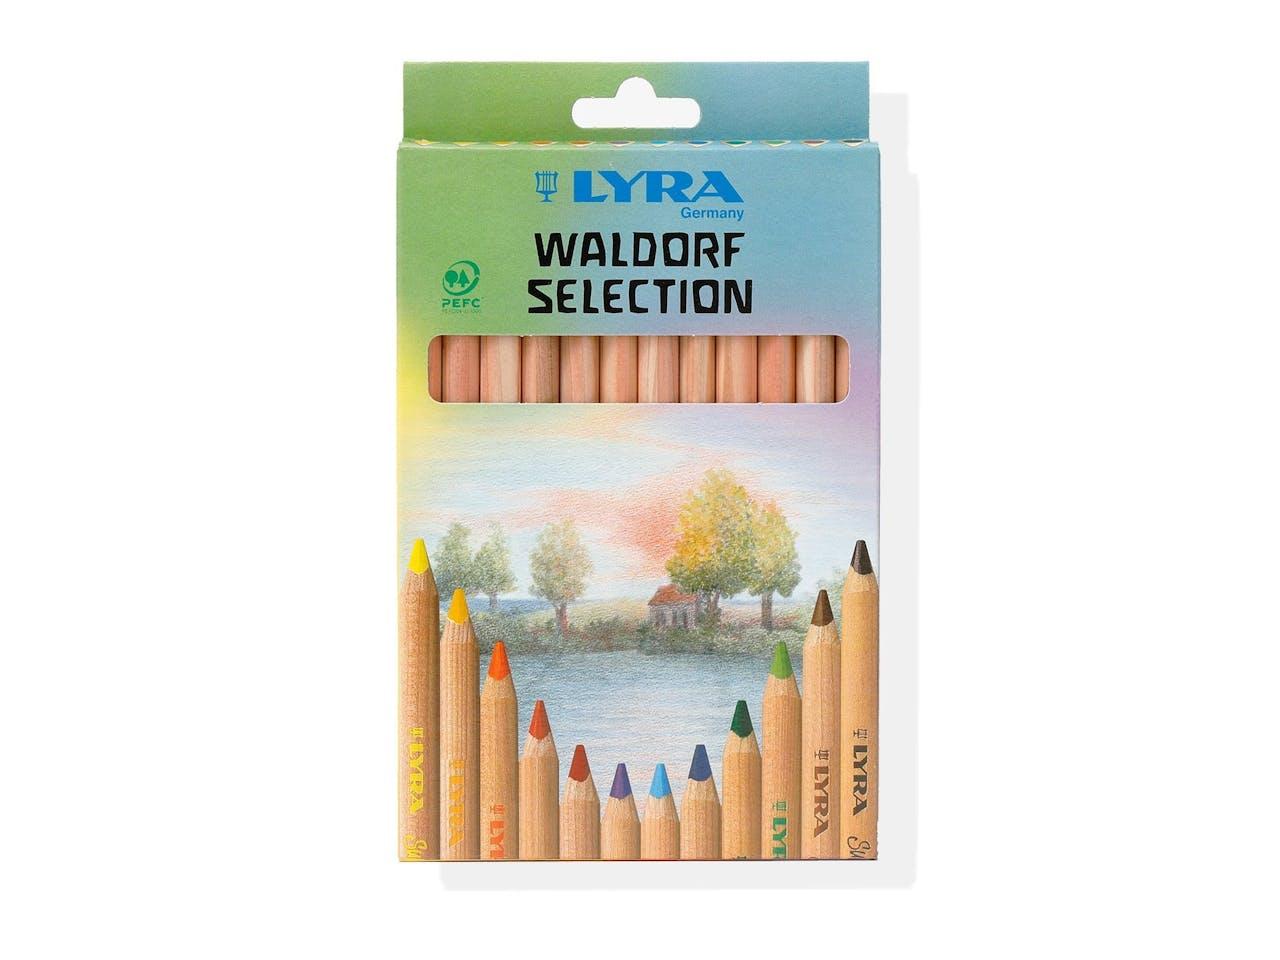 Lyra Buntstifte Waldorf Selection Super Ferby, 12er-Set im Kartonetui, natur